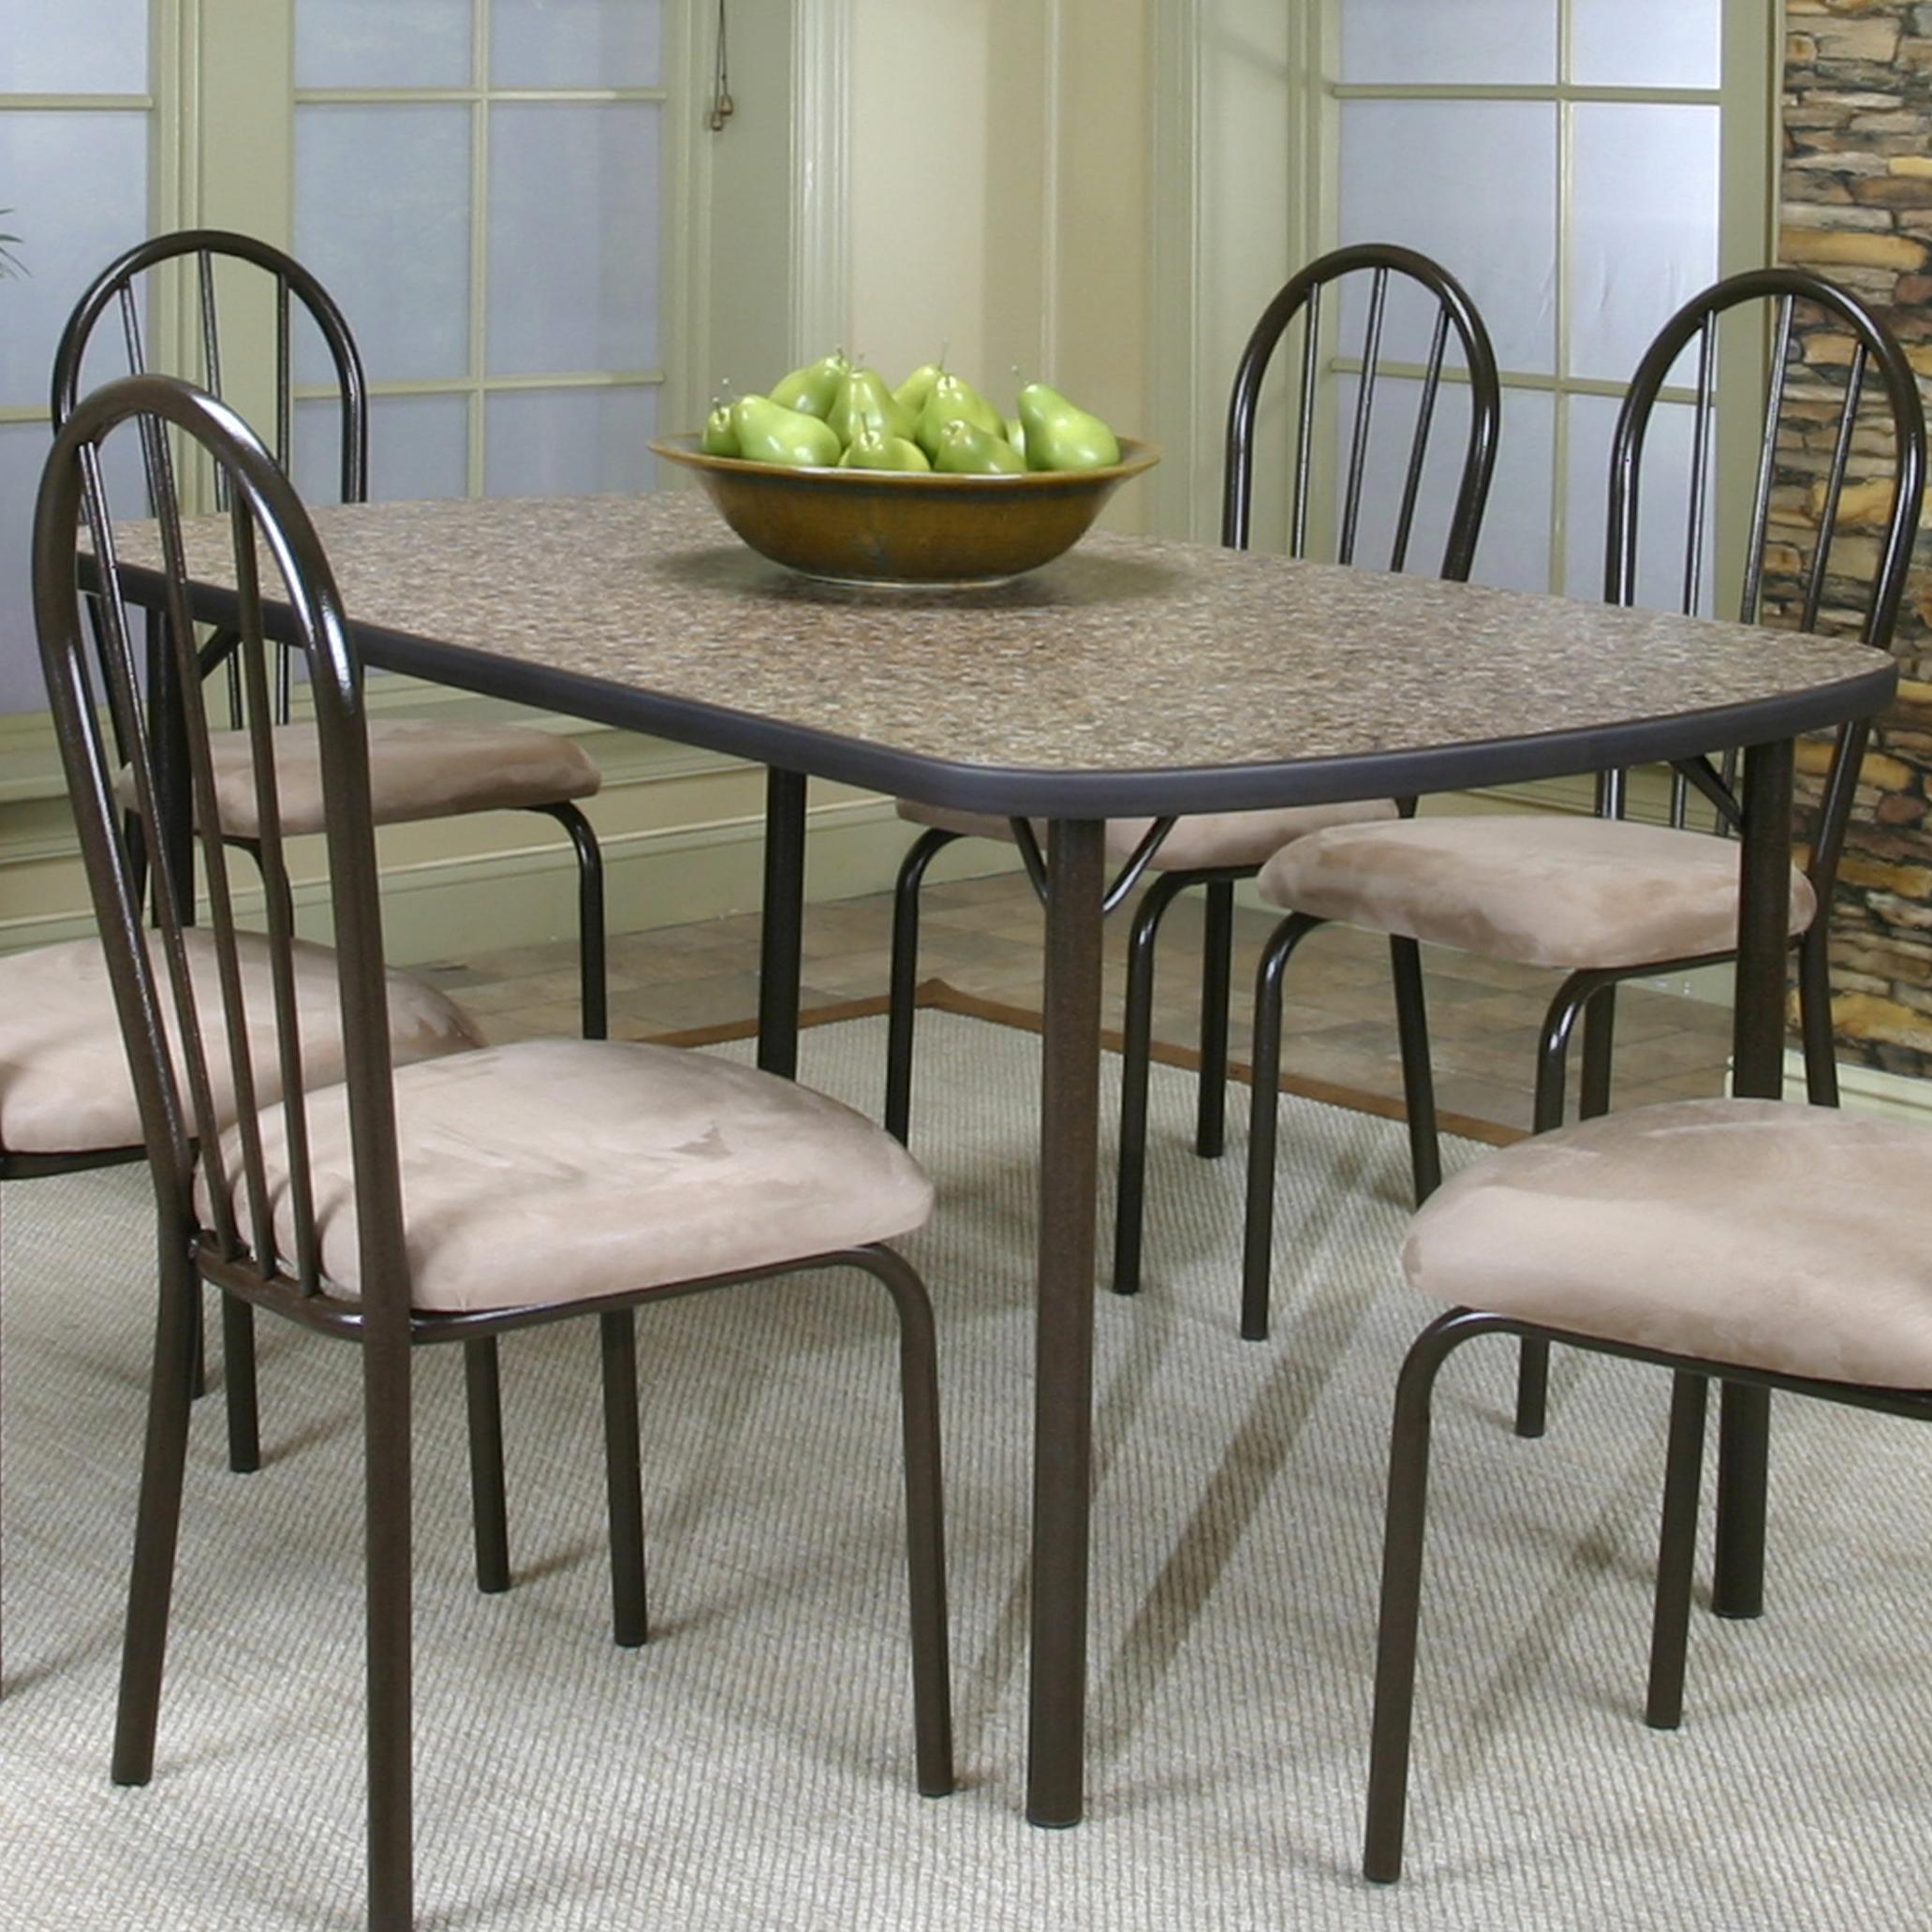 Cramco, Inc Cramco Dinettes - Heath Woodstock Granite Laminate Top Table - Item Number: D7227-53